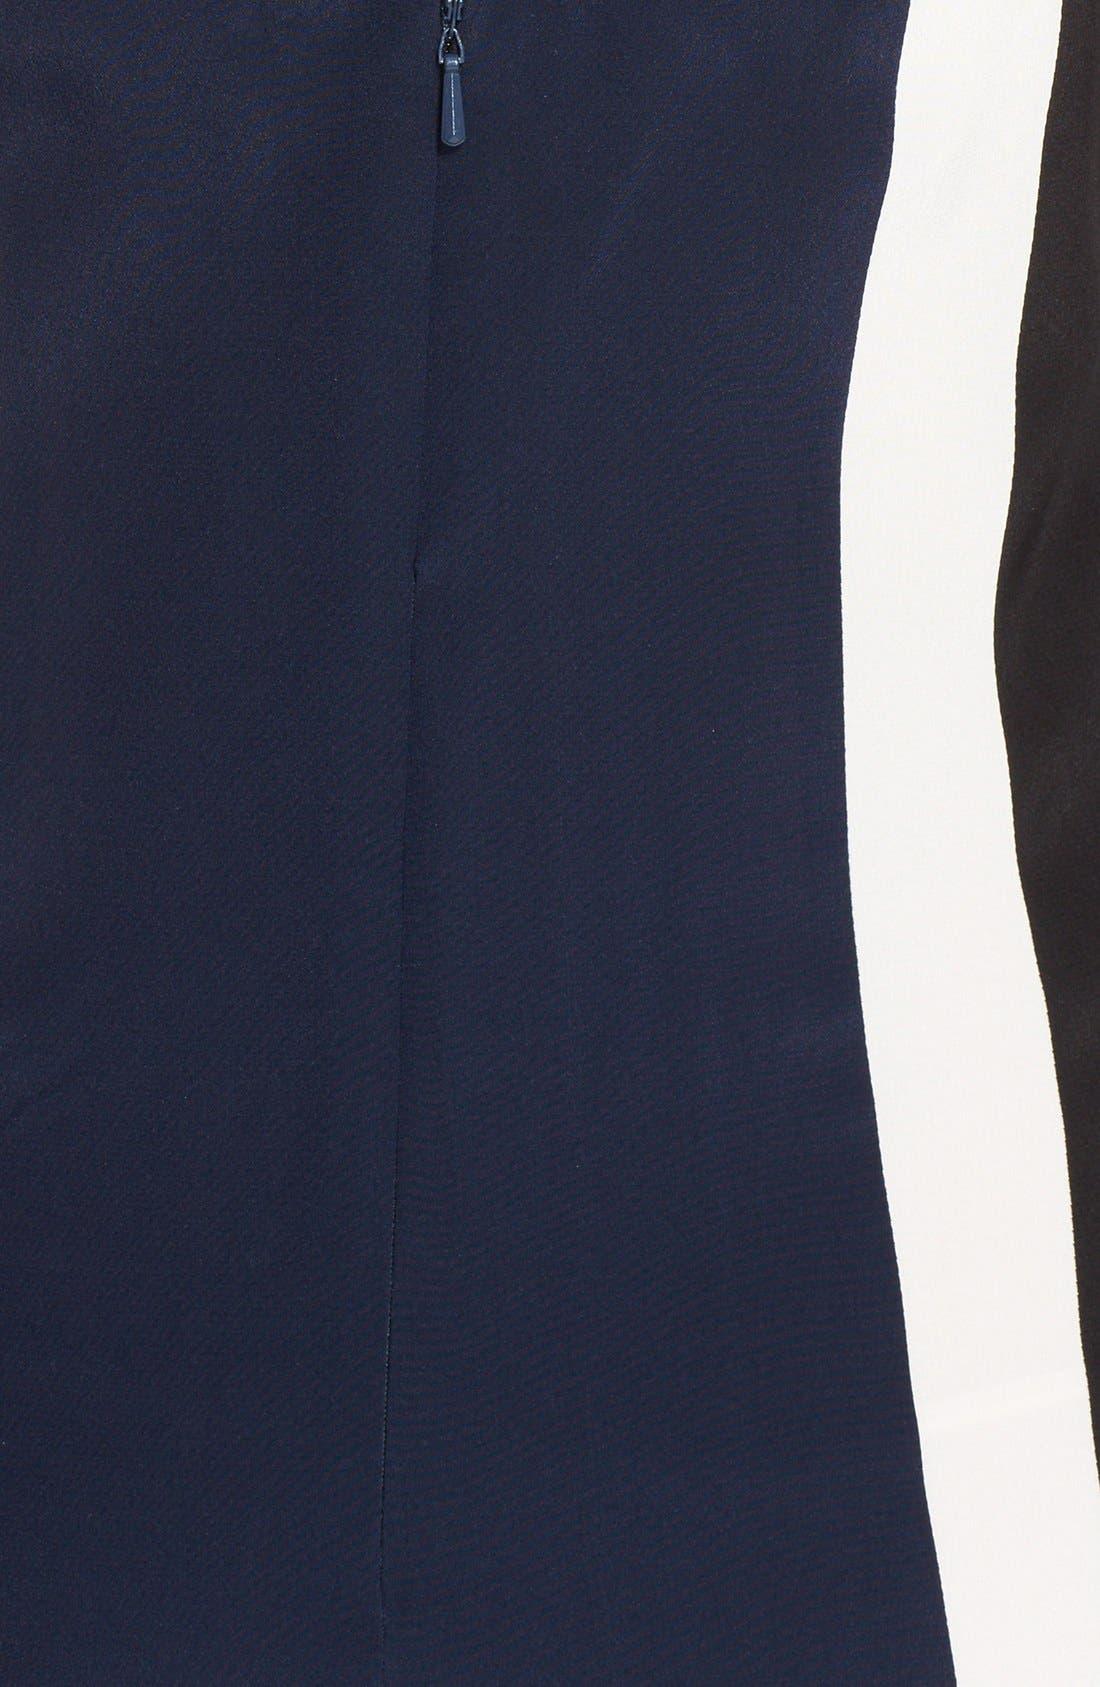 Alternate Image 3  - Jay Godfrey 'Simons' Paneled Silk Maxi Dress